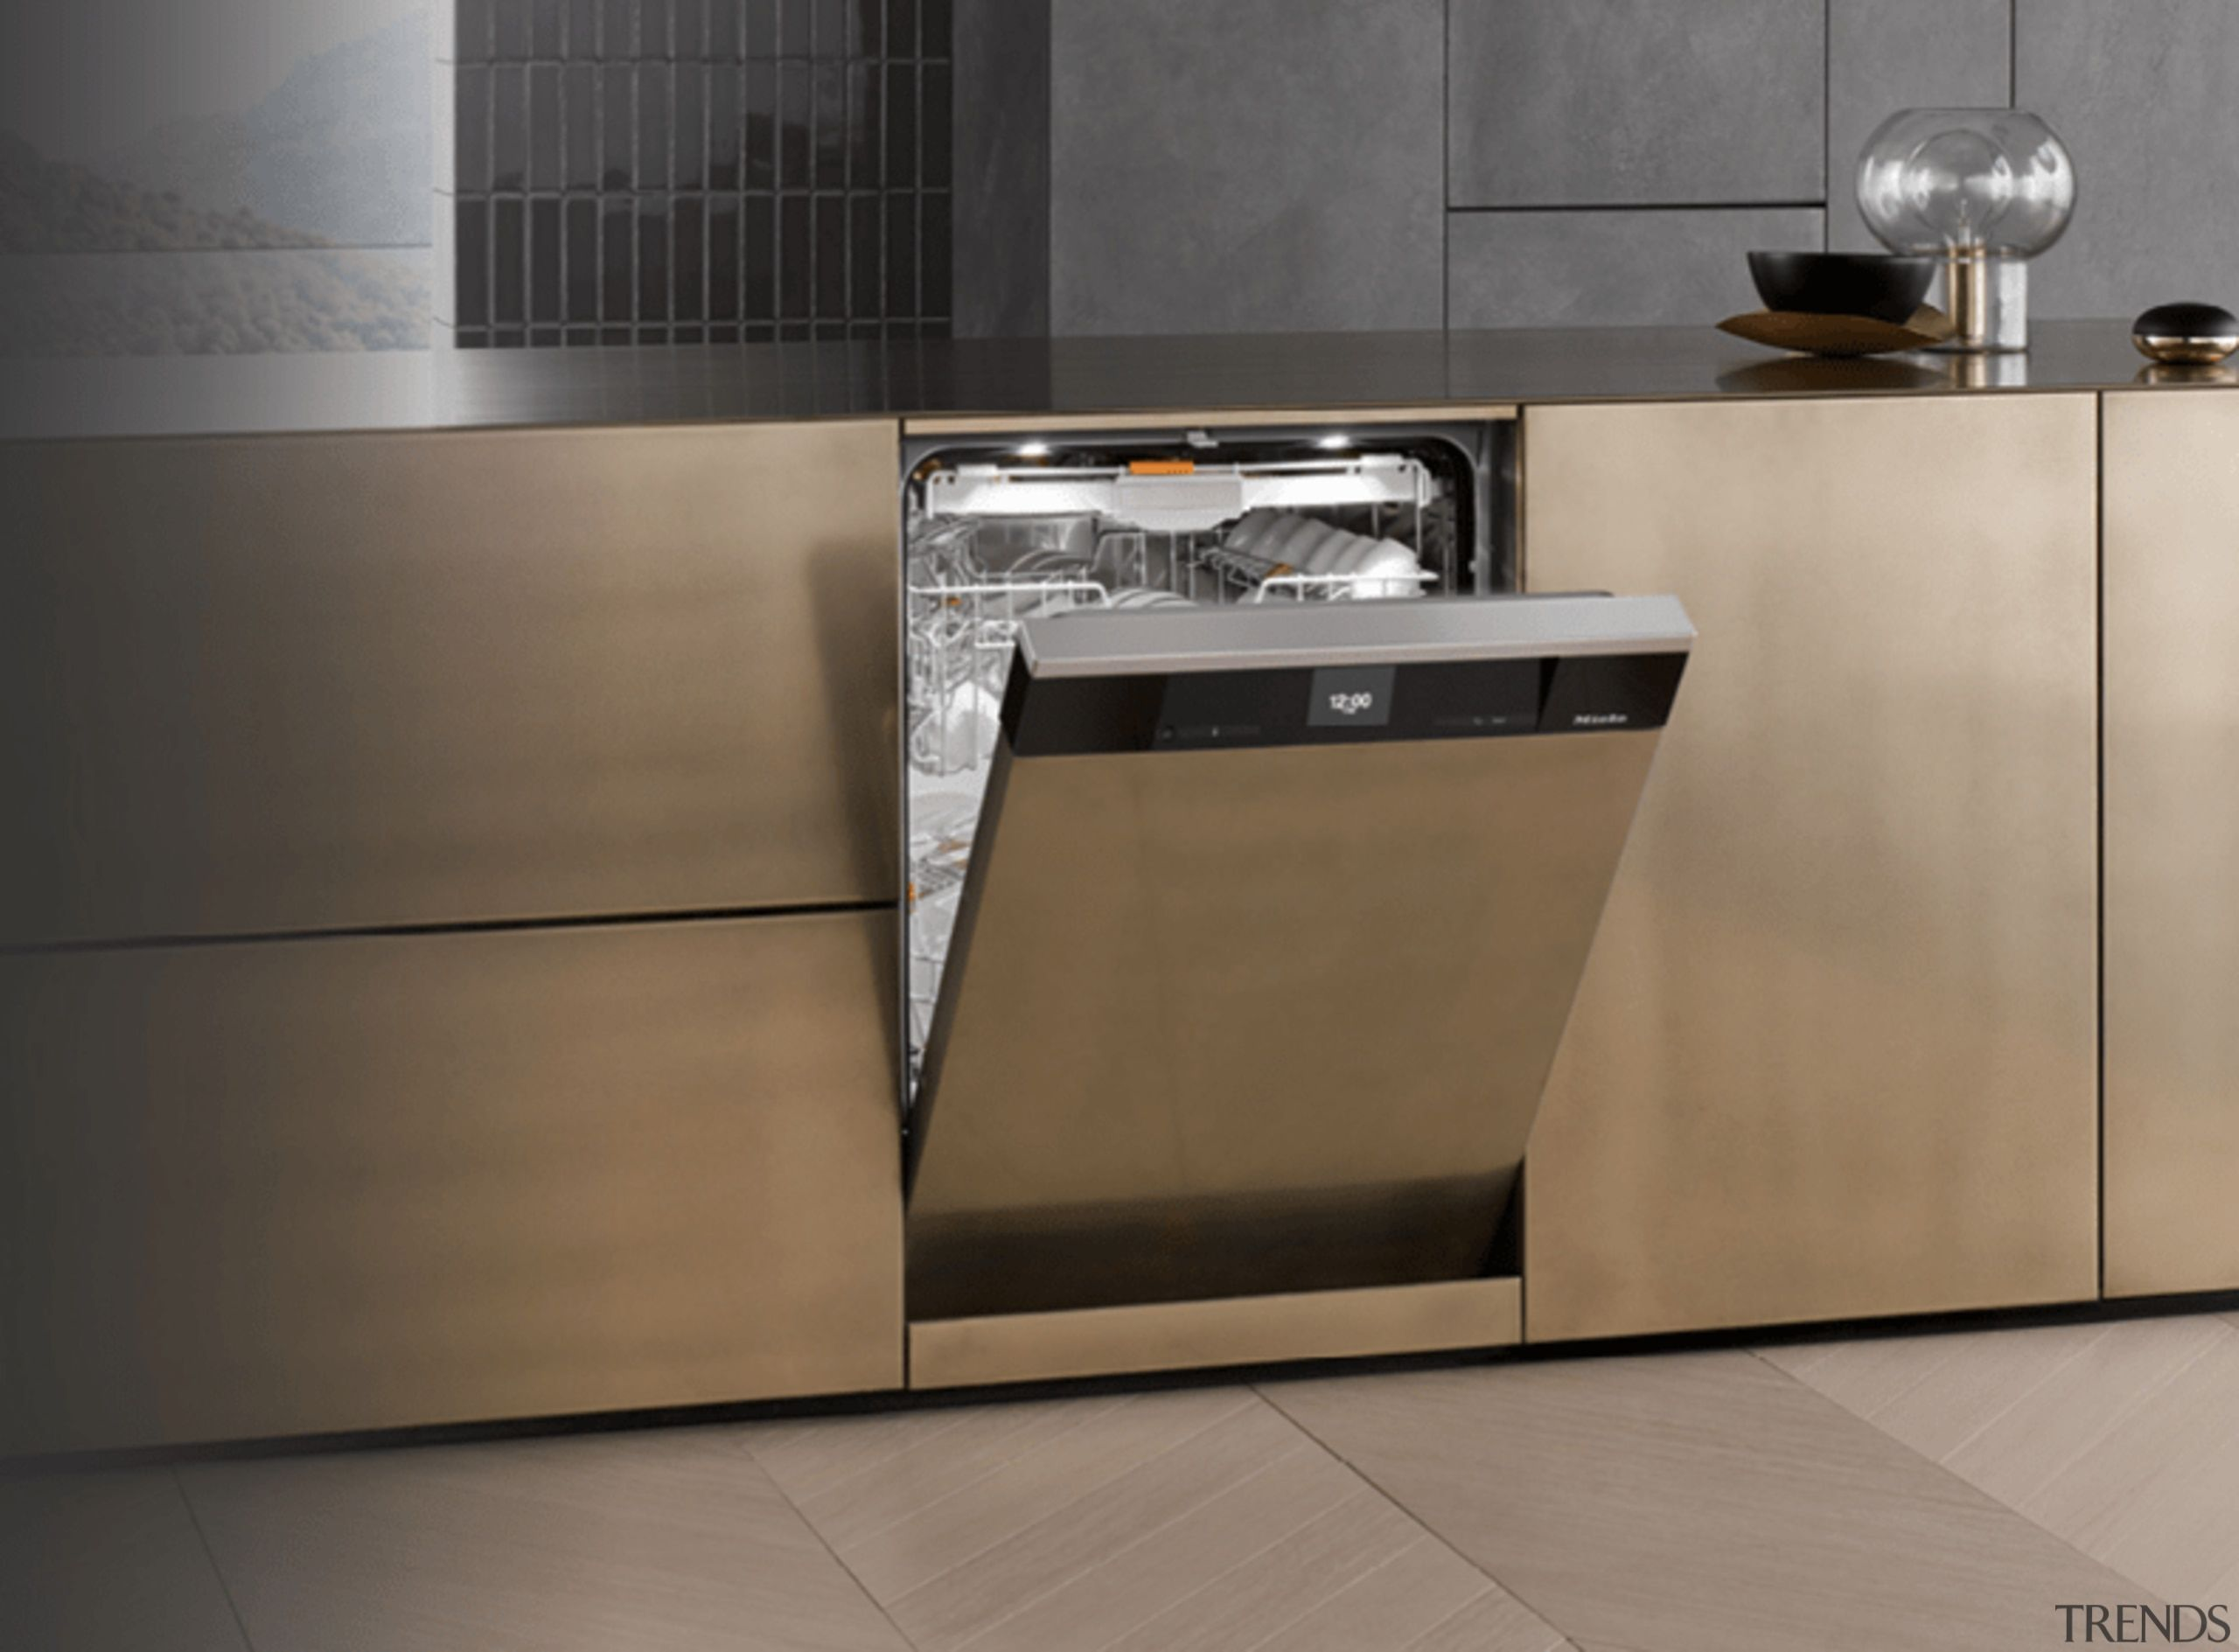 Miele Semi Integrated Dishwasher Ideas Want Miele Fully